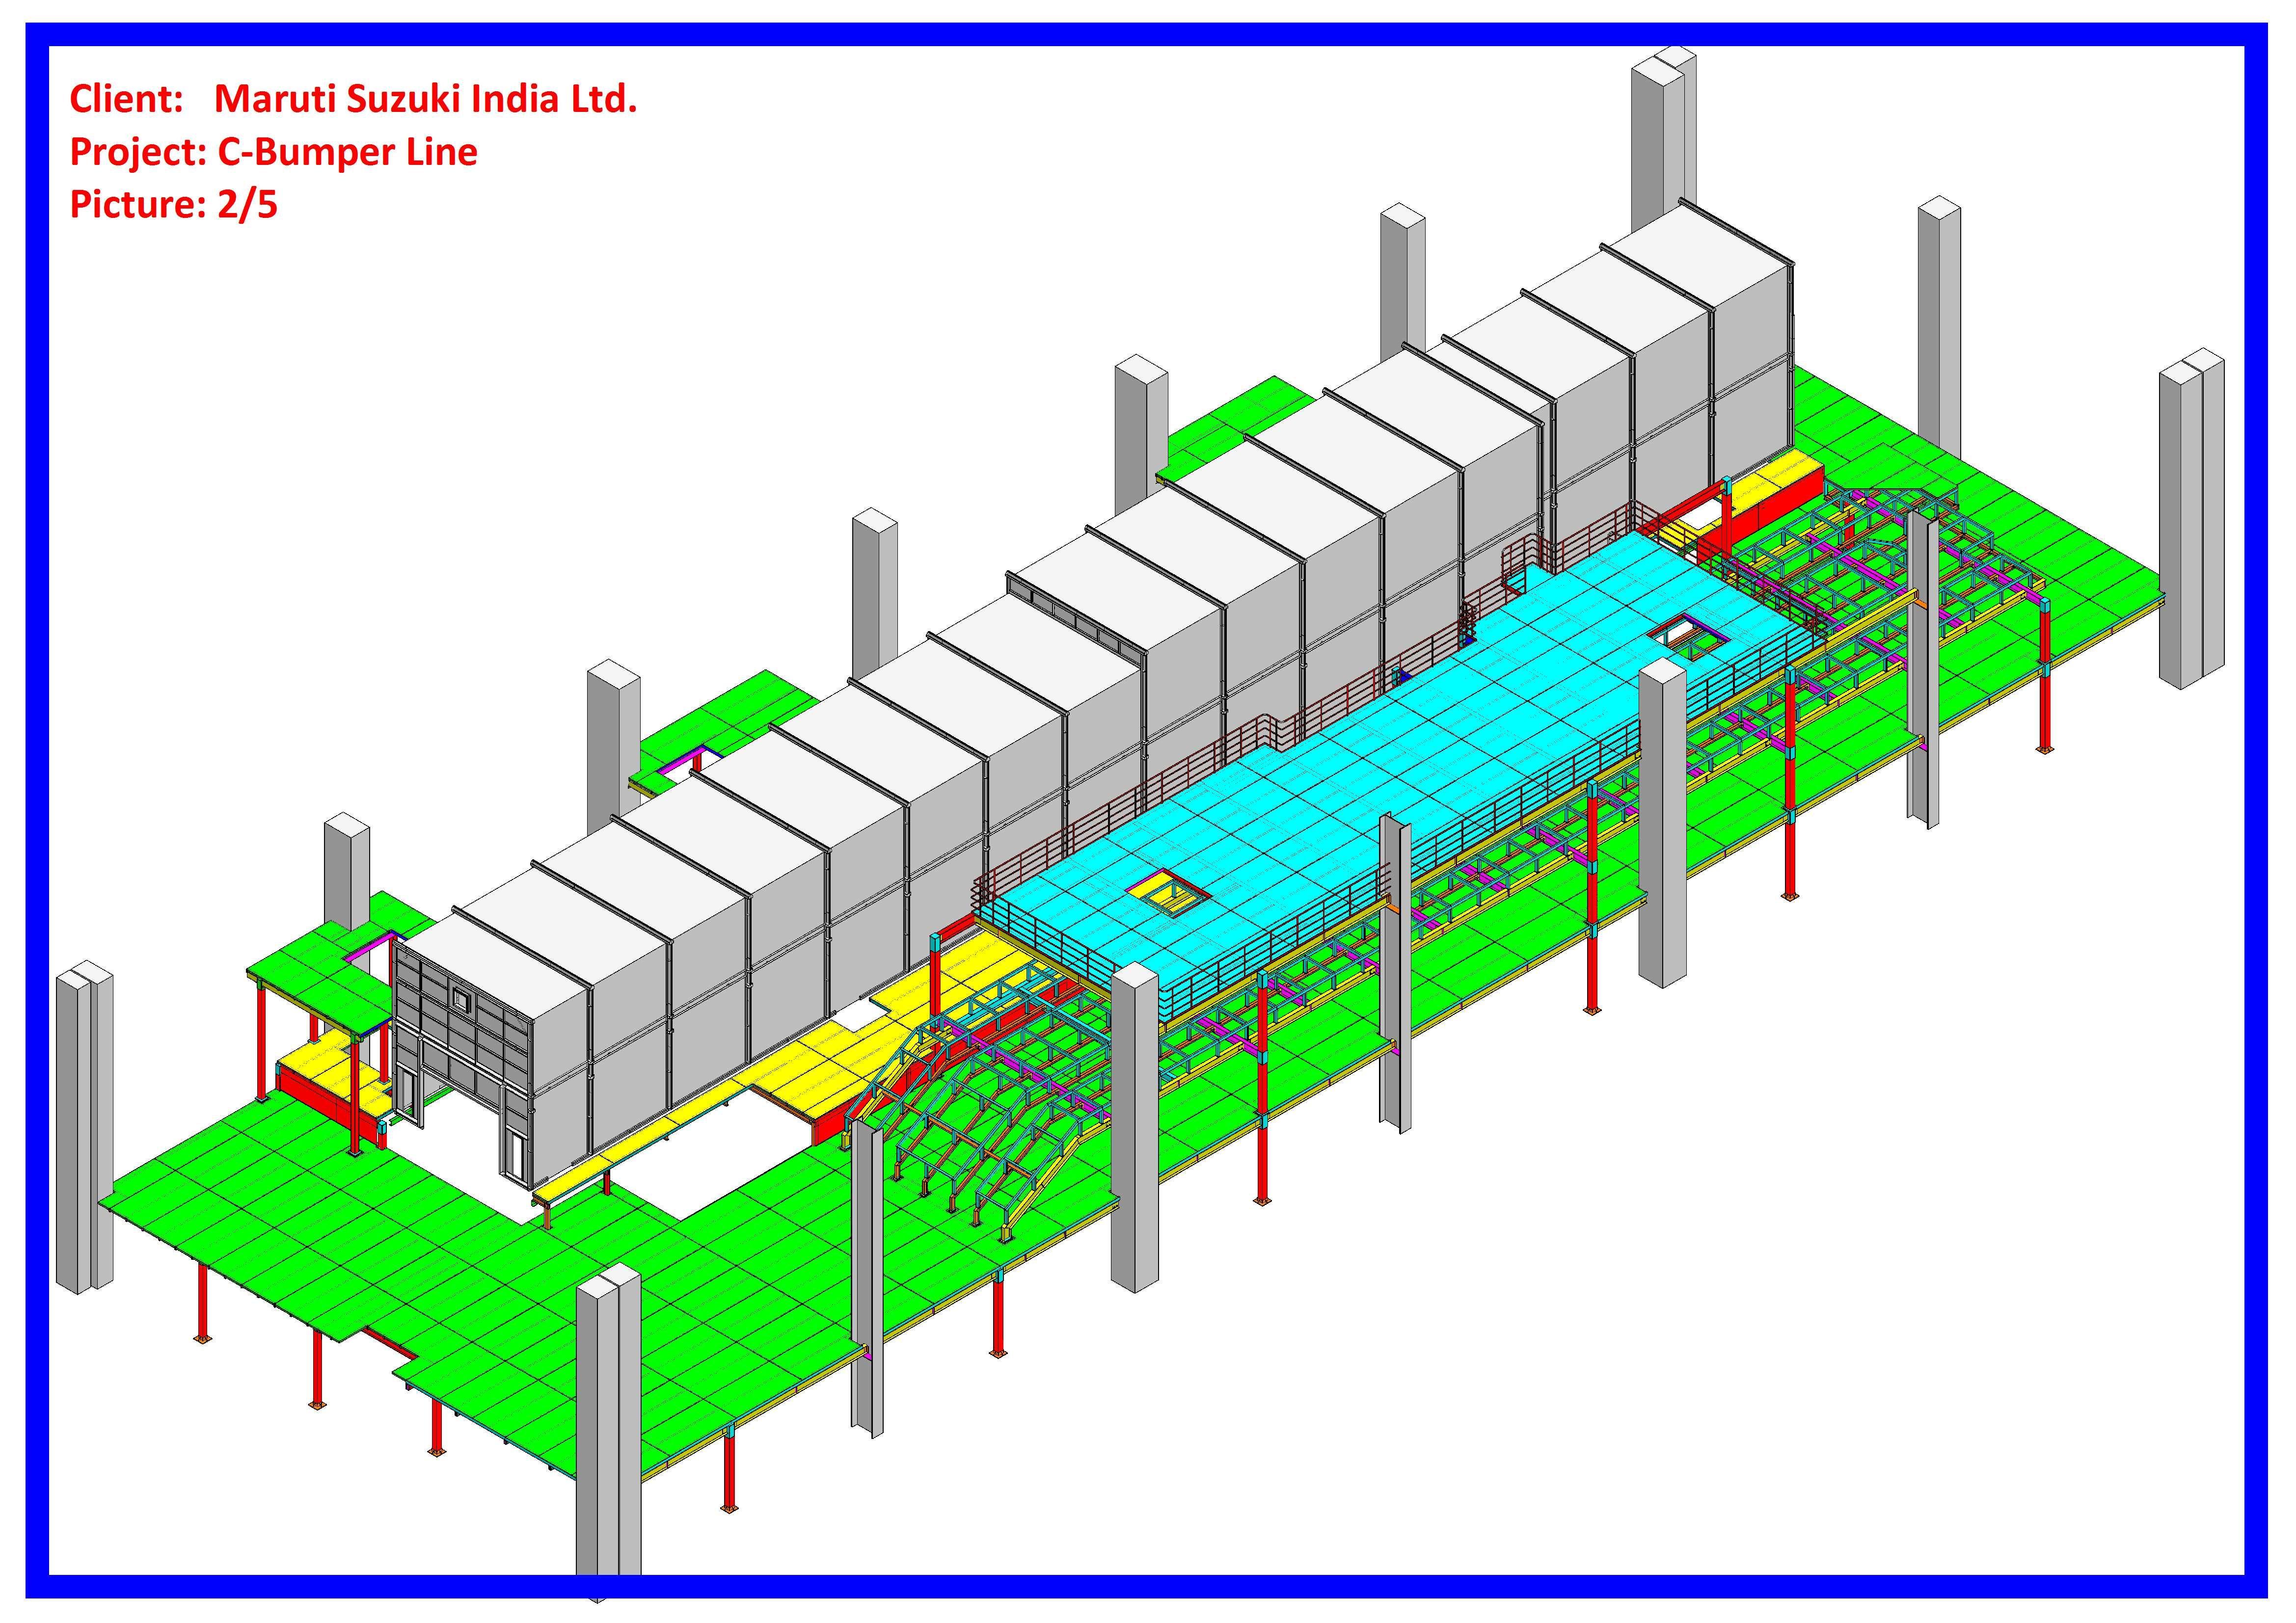 Car Manufacturing Plant Taikisha Engineering India Ltd